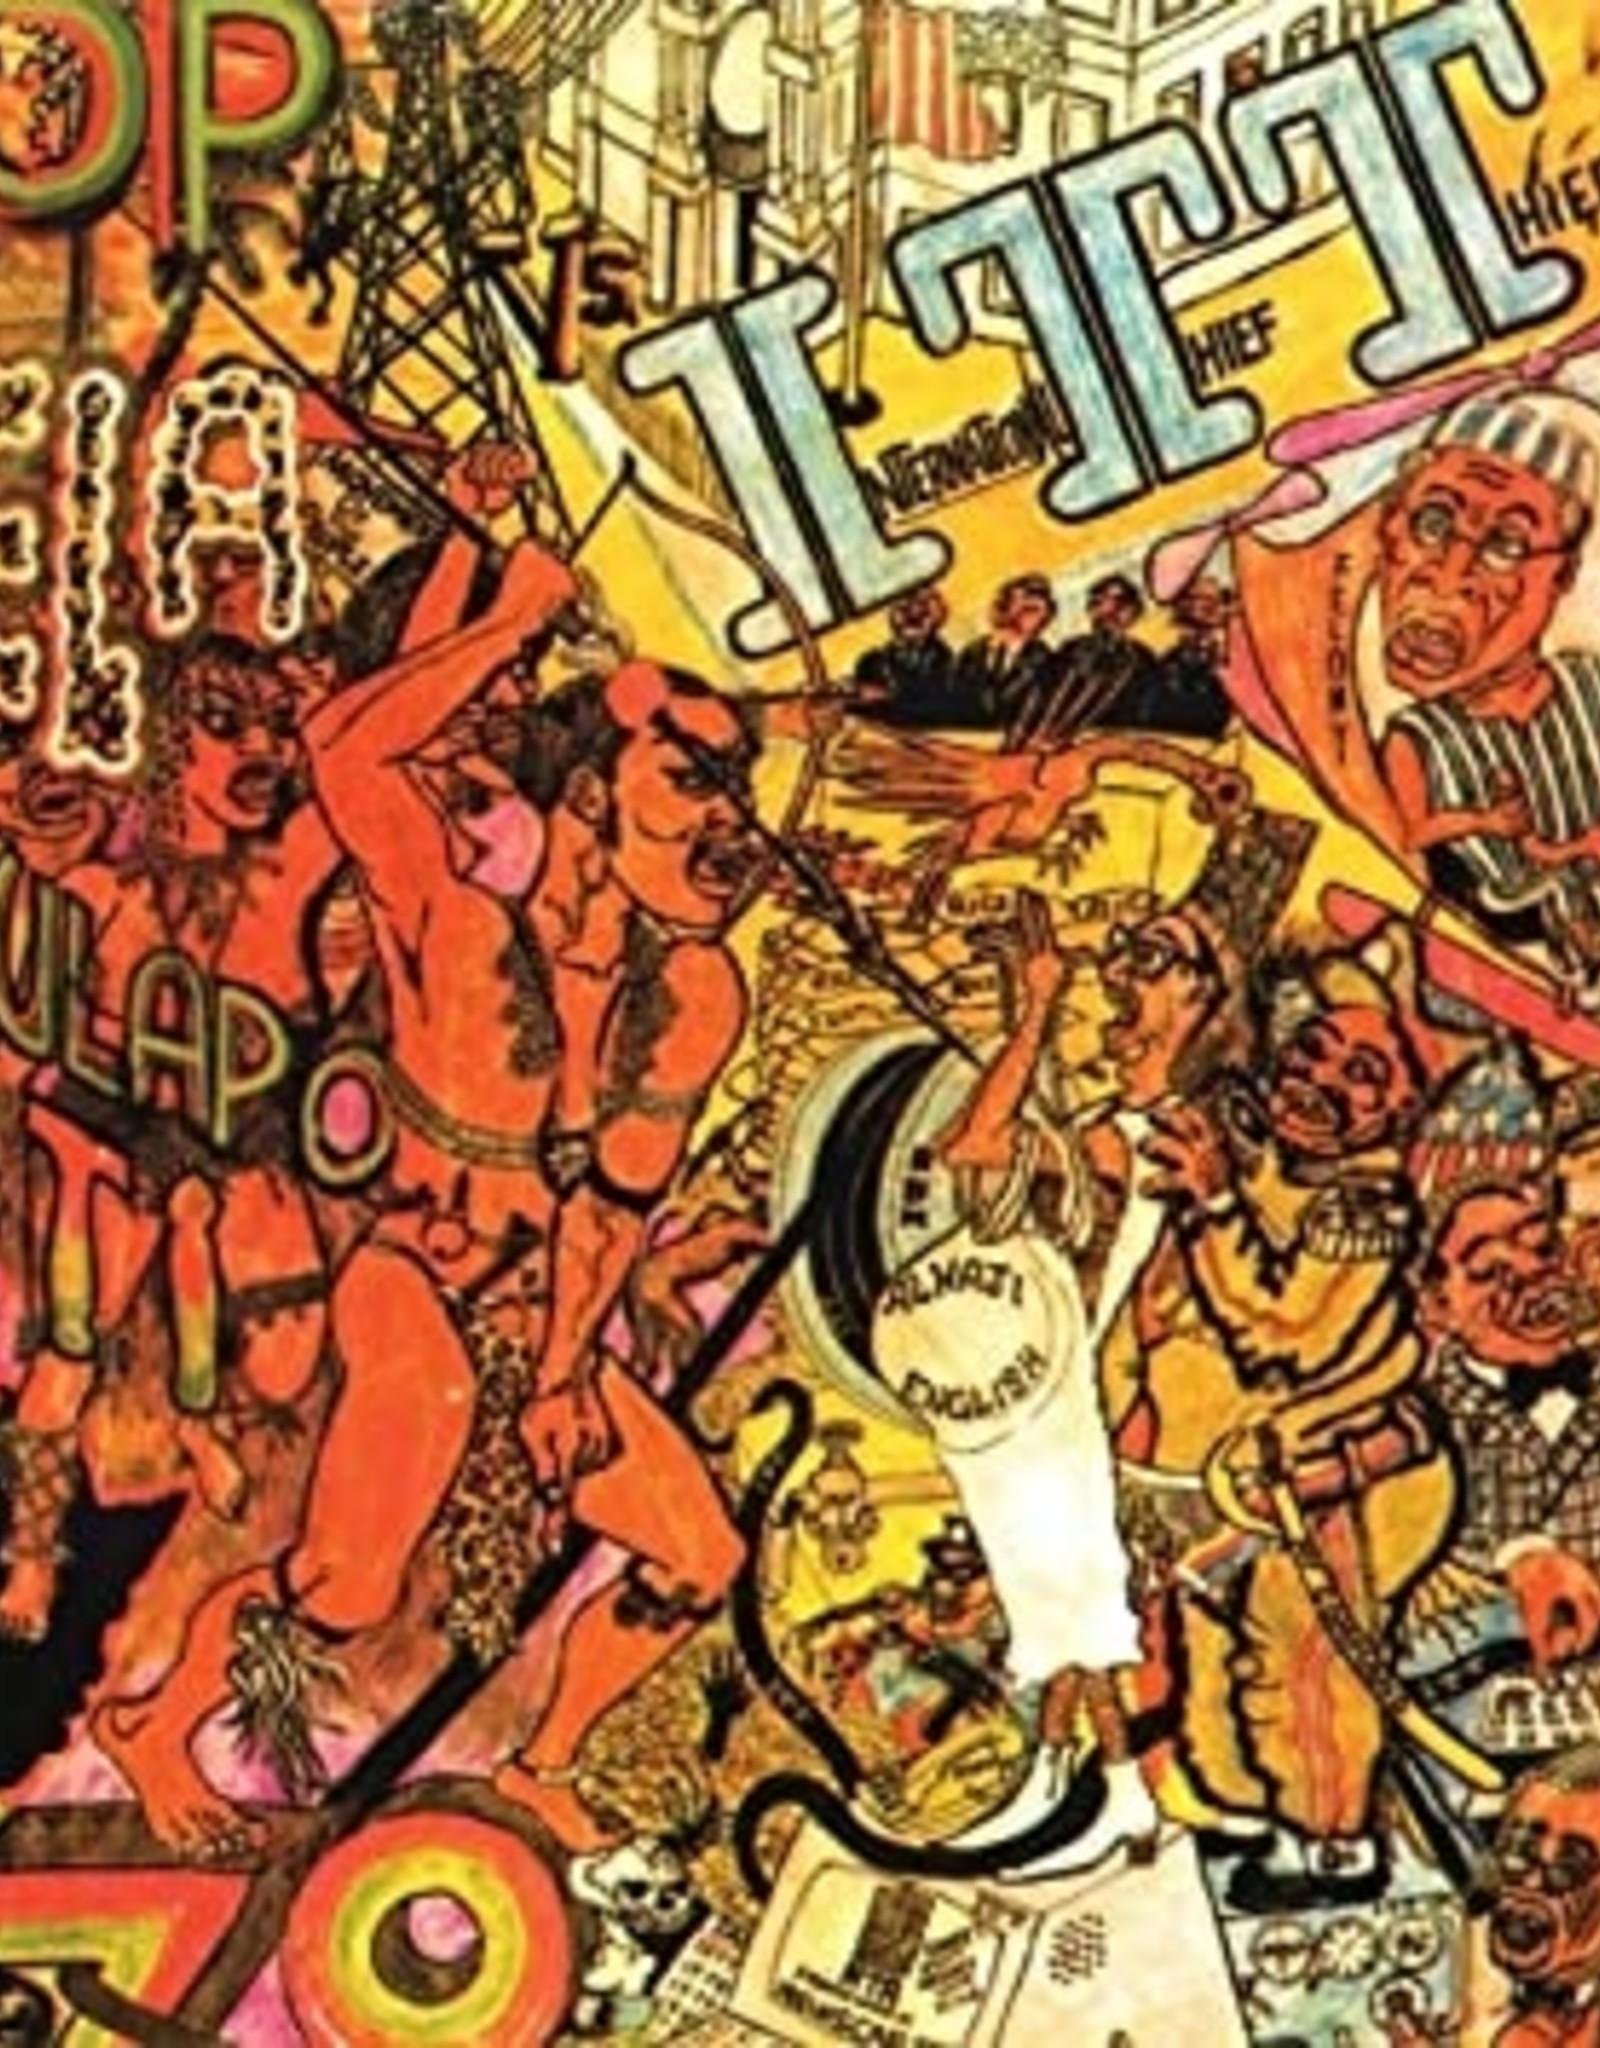 Fela Kuti - I.T.T.